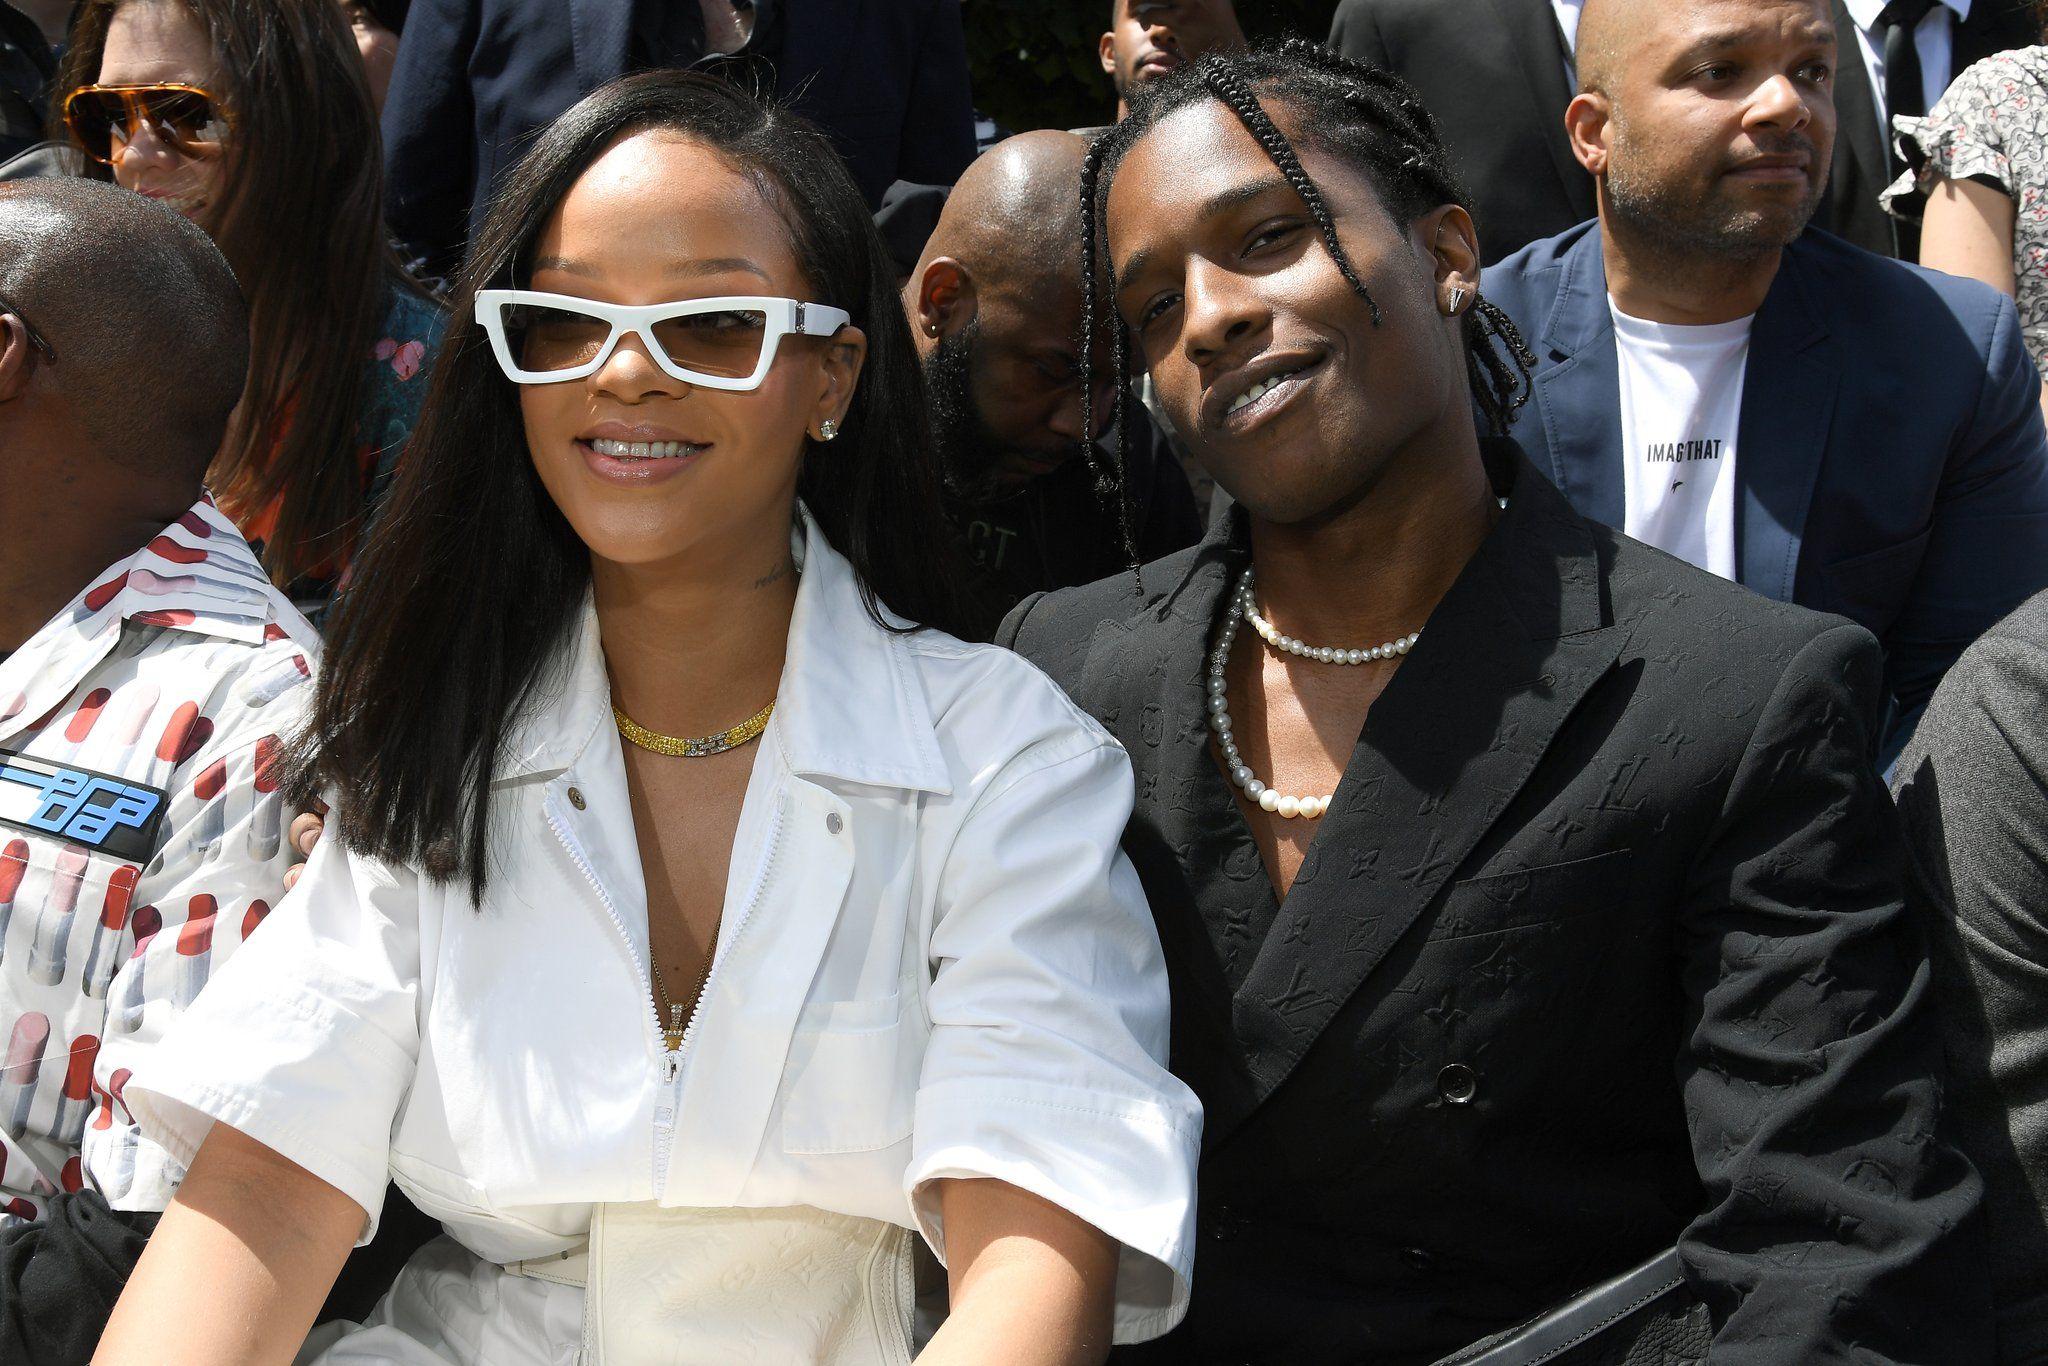 Rihanna Gets Cozy With Ex-Flame A$AP Rocky at the Louis Vuitton Runway Show in Paris | Rihanna photos, Rihanna, Fashion